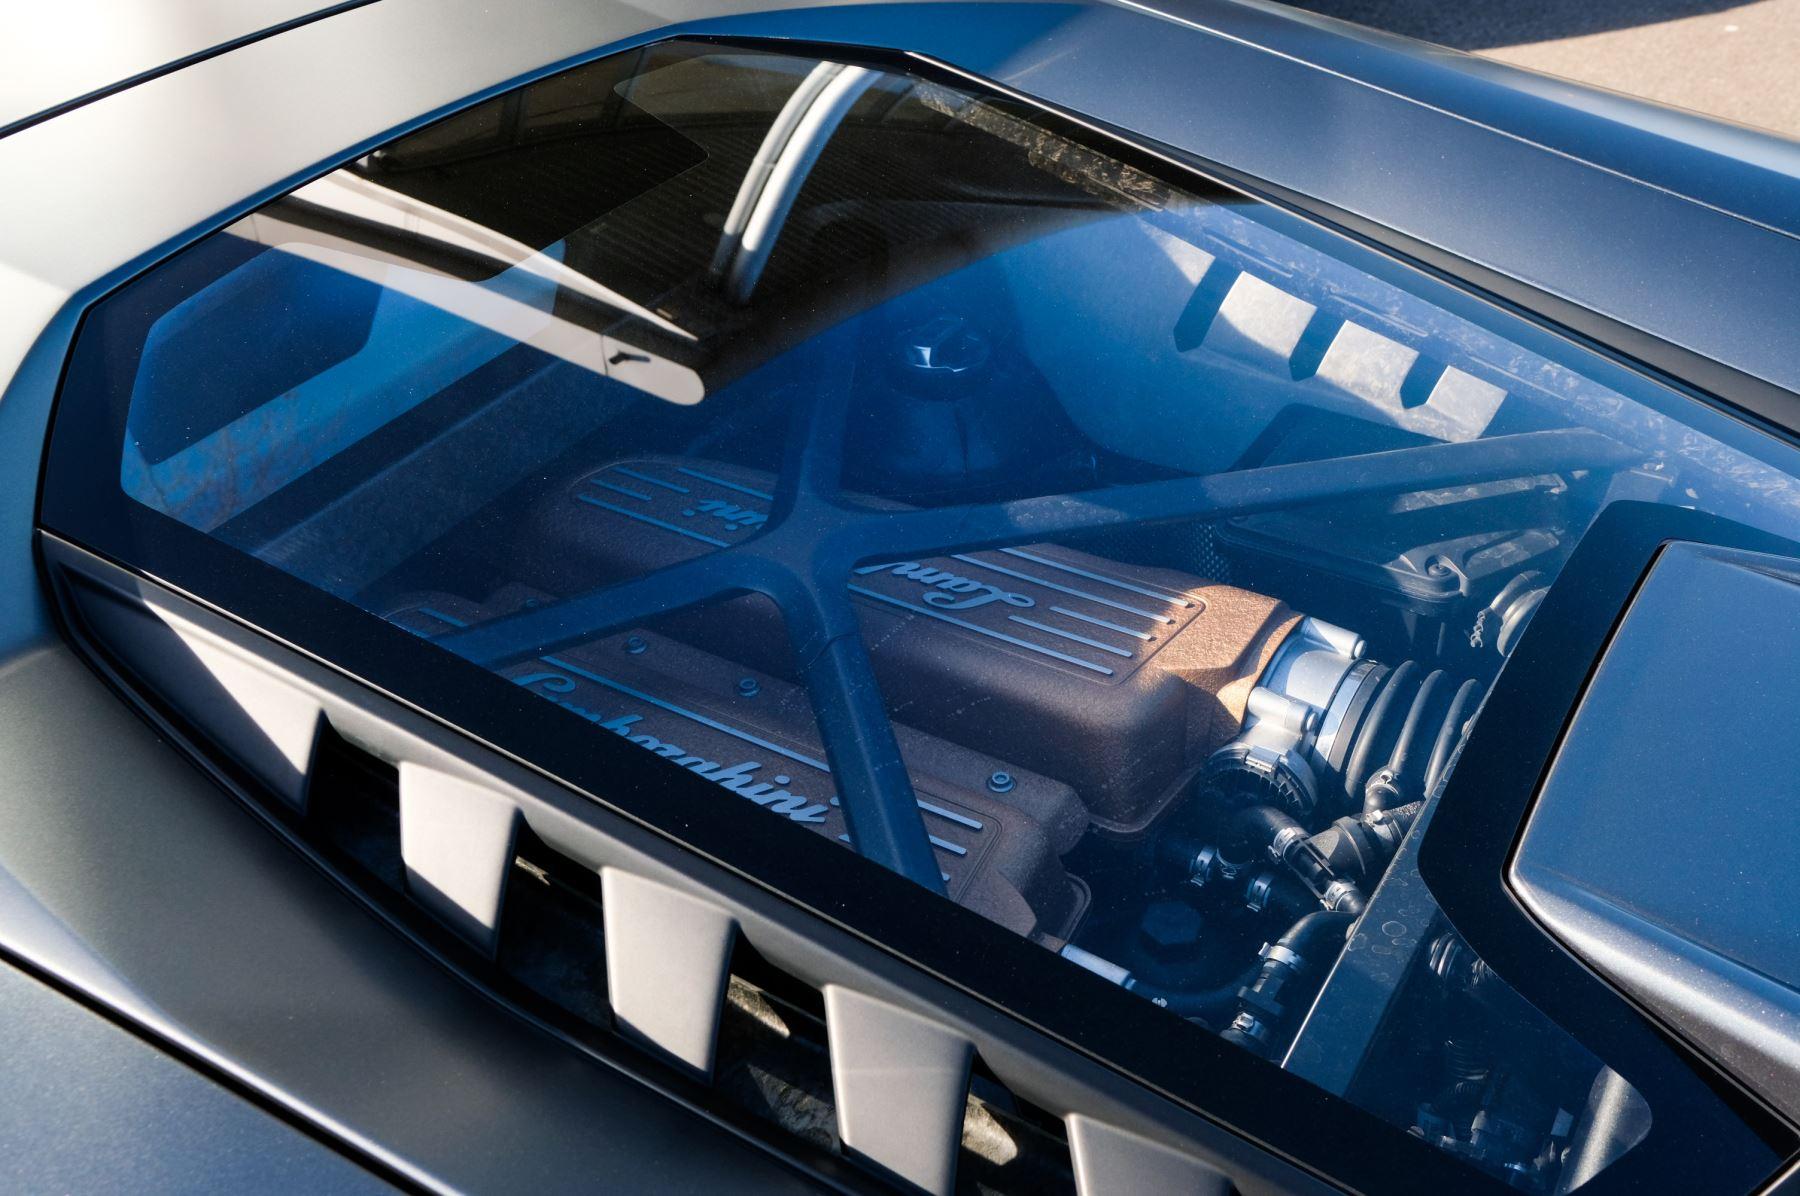 Lamborghini Huracan Performante LP 640-4 2dr LDF - Carbon Ceramic Brakes - Carbon Fiber Features - Comfort Seats image 15